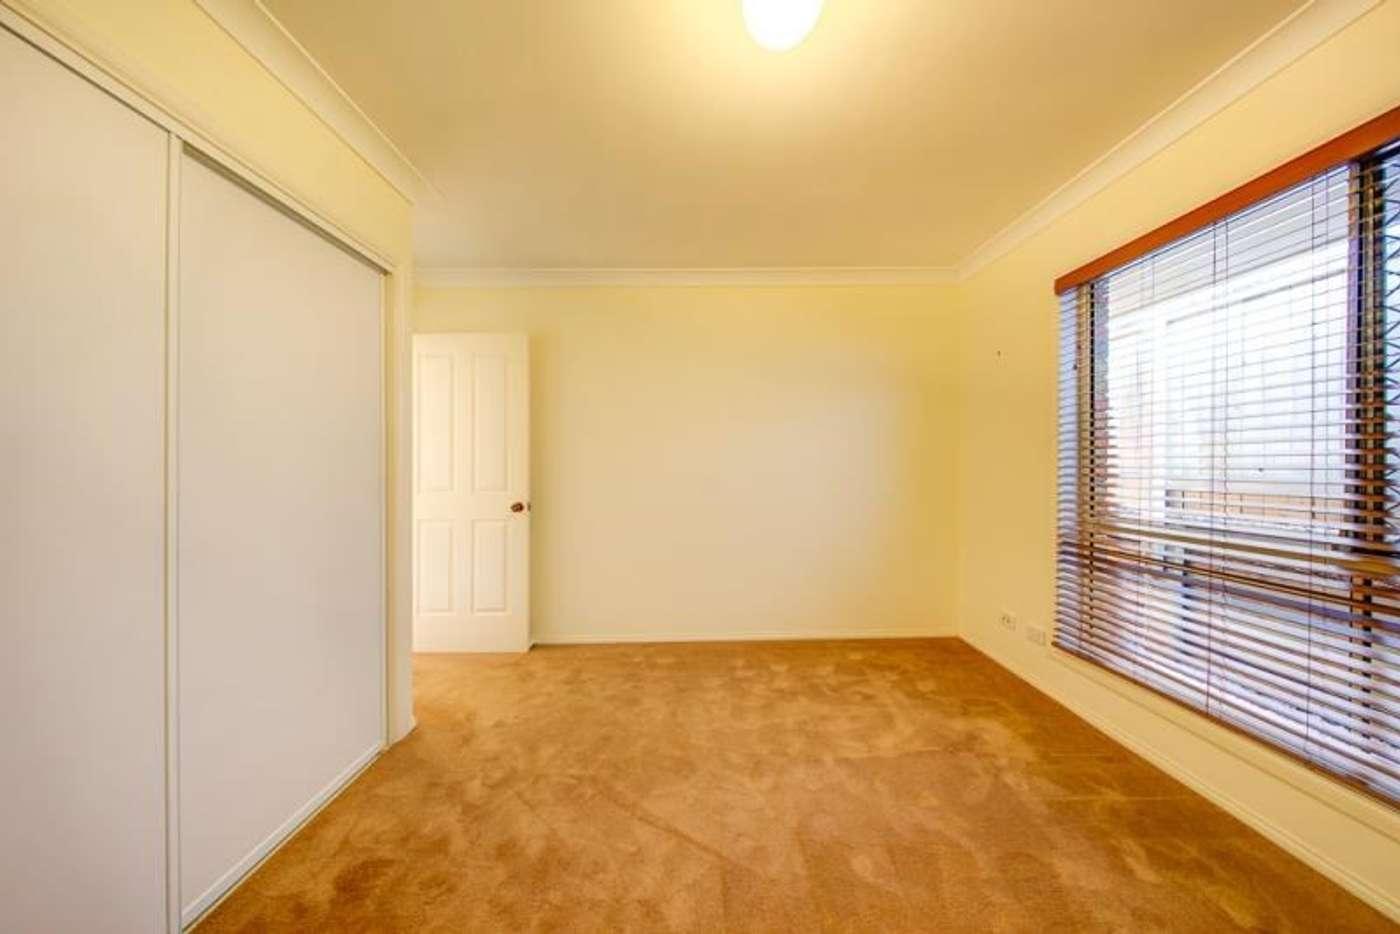 Sixth view of Homely villa listing, 5/30 Railton Street, Aspley QLD 4034